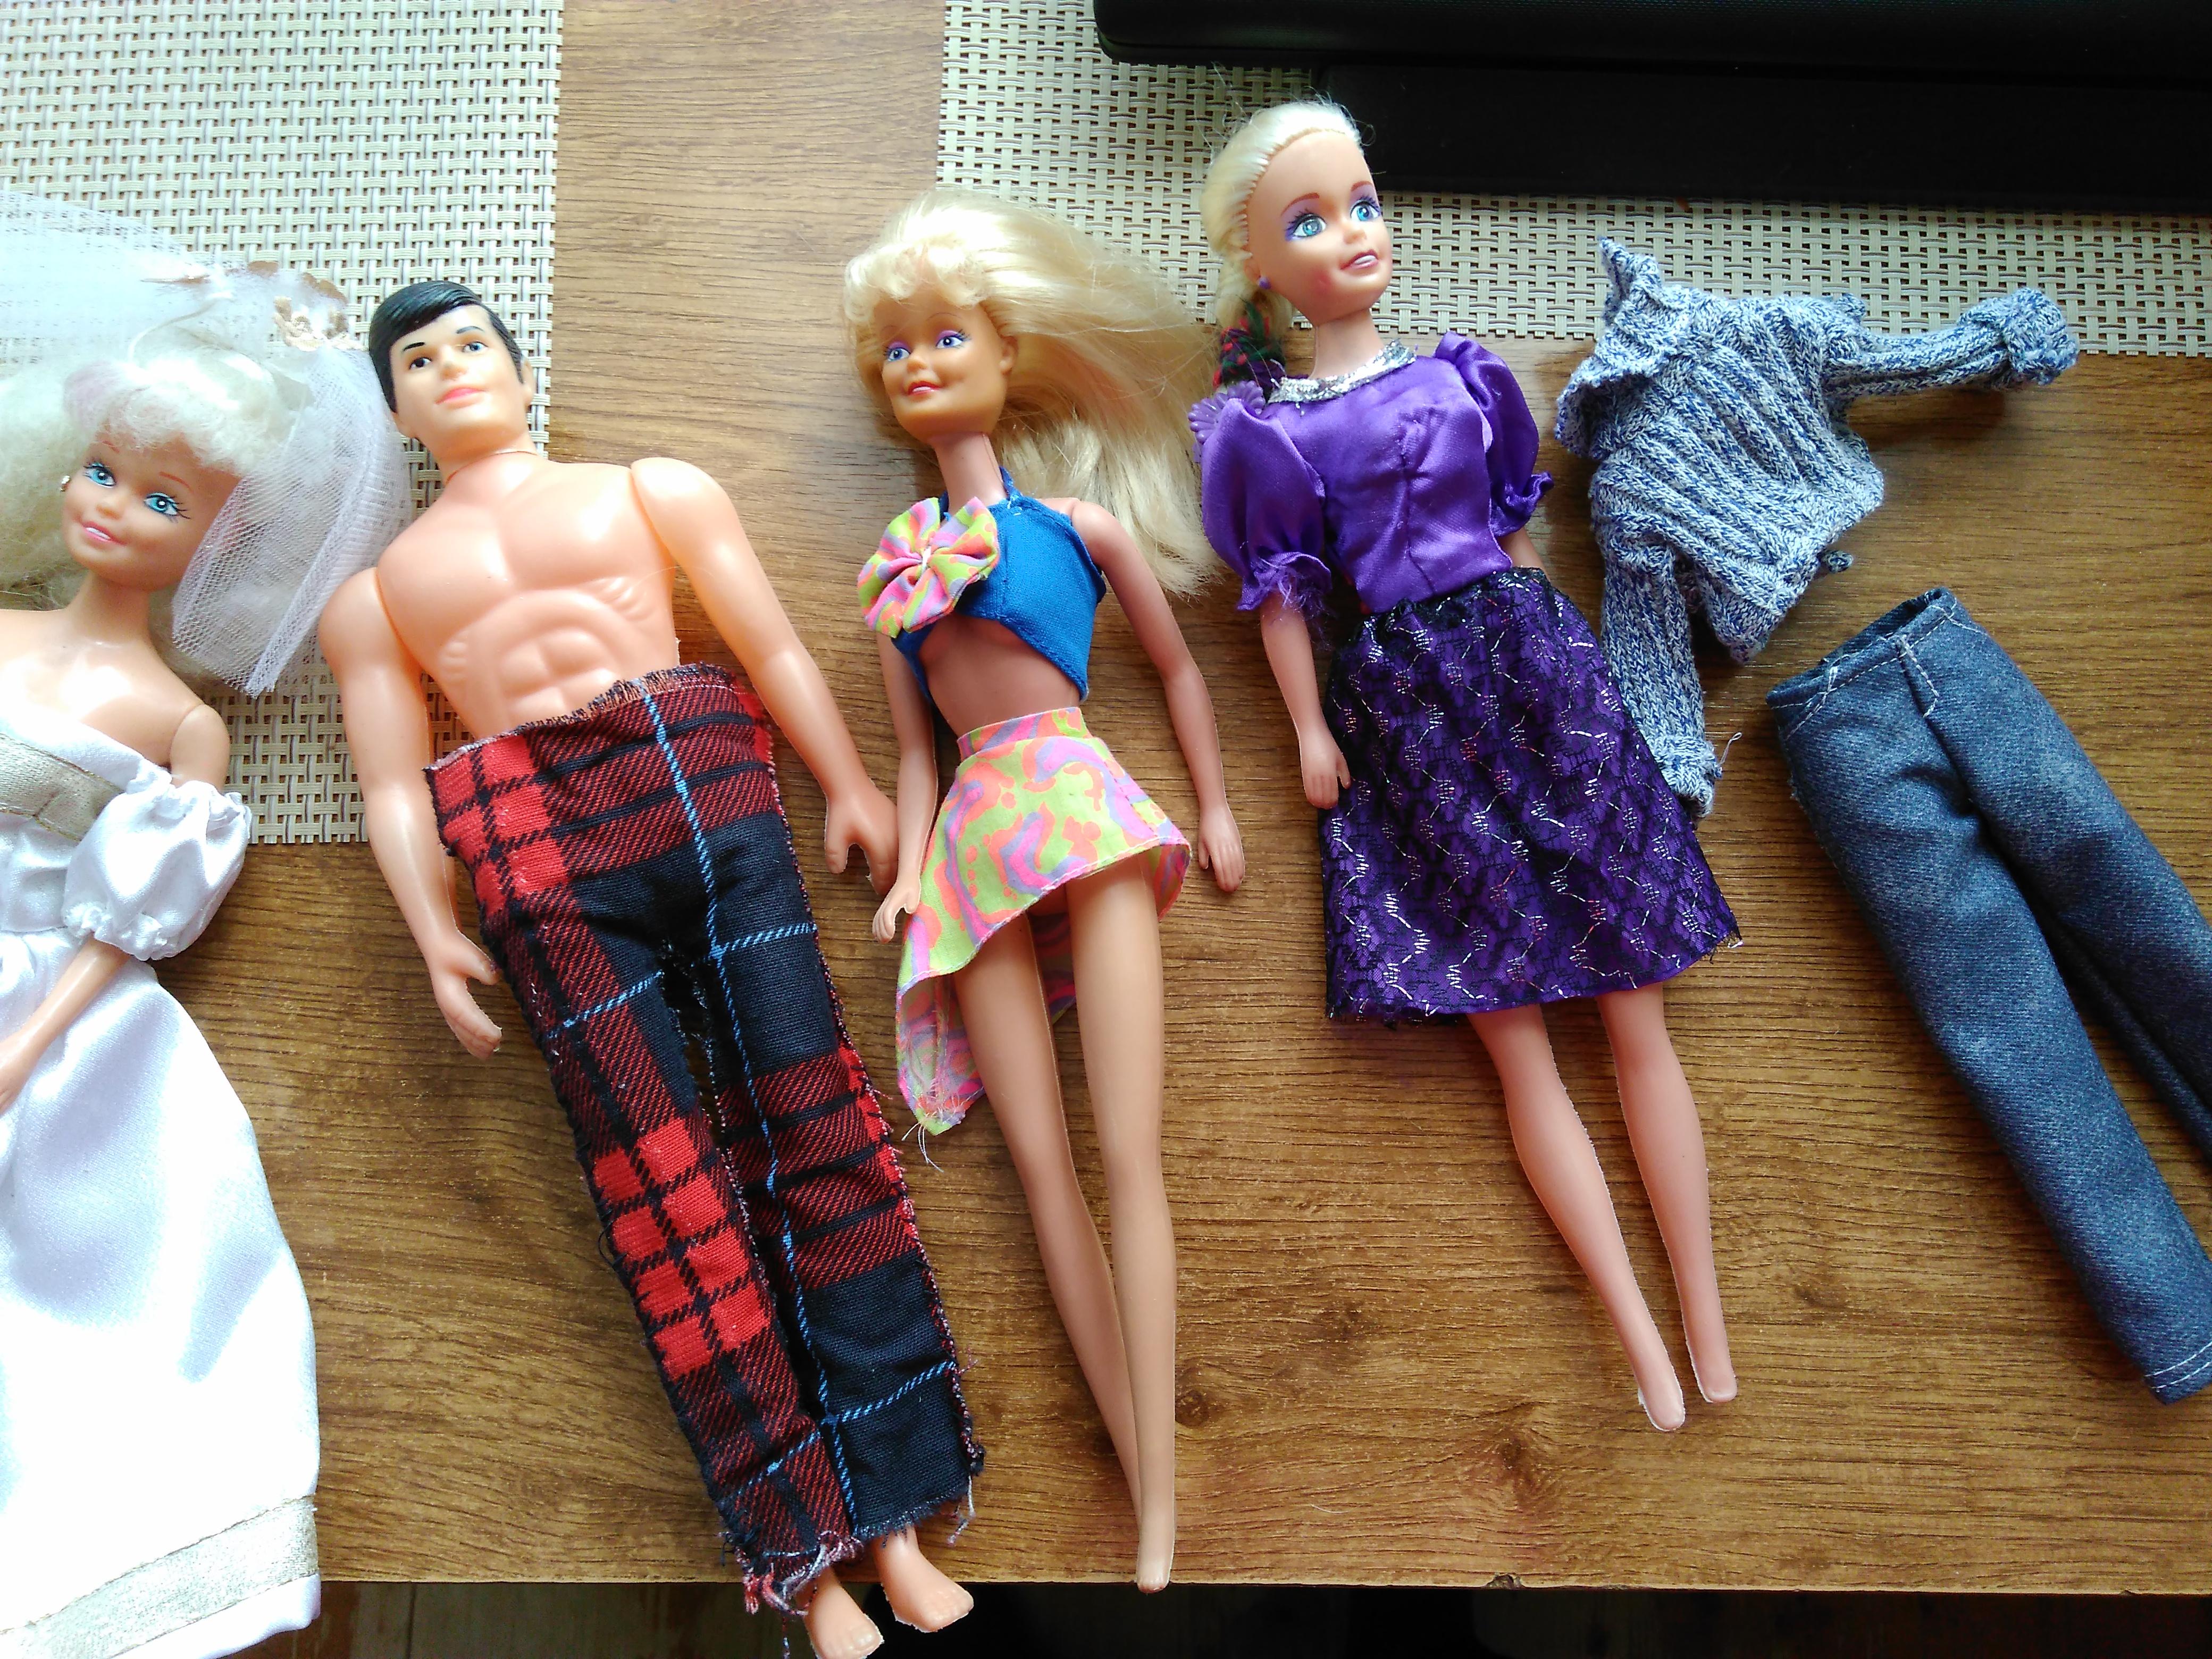 6d84bba7d Darujem bábiky Barbie - Venujem